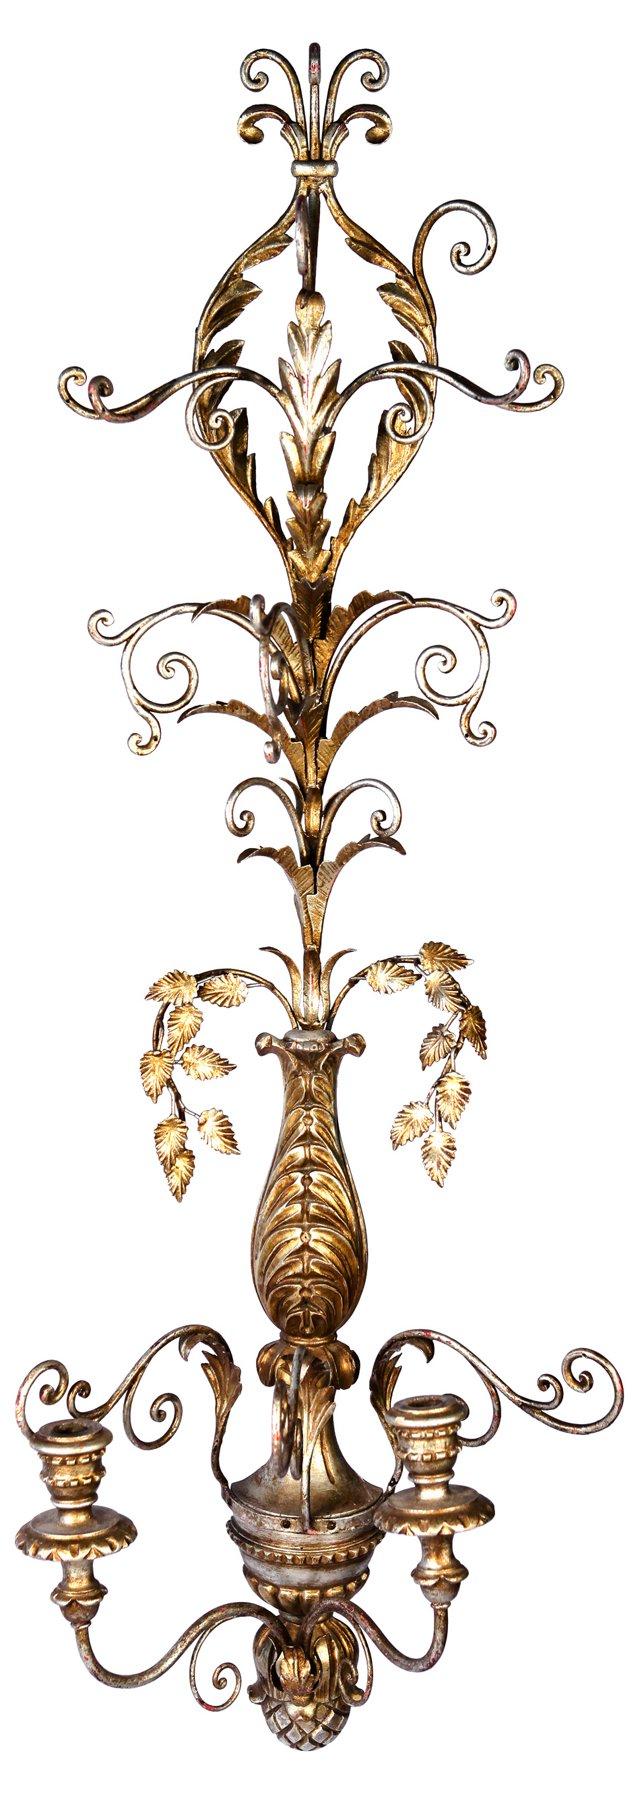 Baroque Revival Sconce